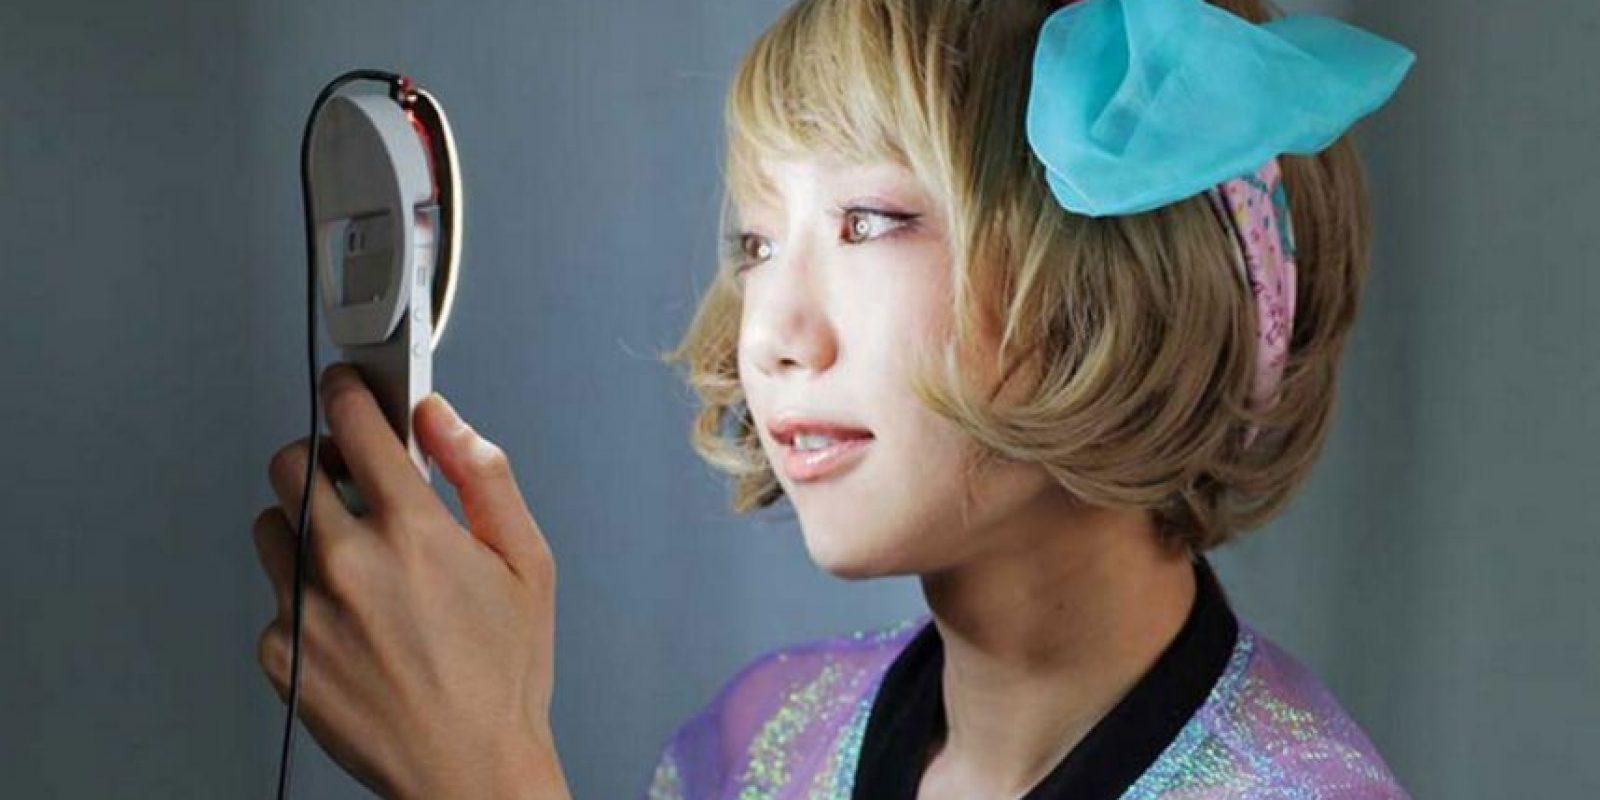 Así luce Kira, el aro para móviles que perfecciona los selfies Foto:Kira